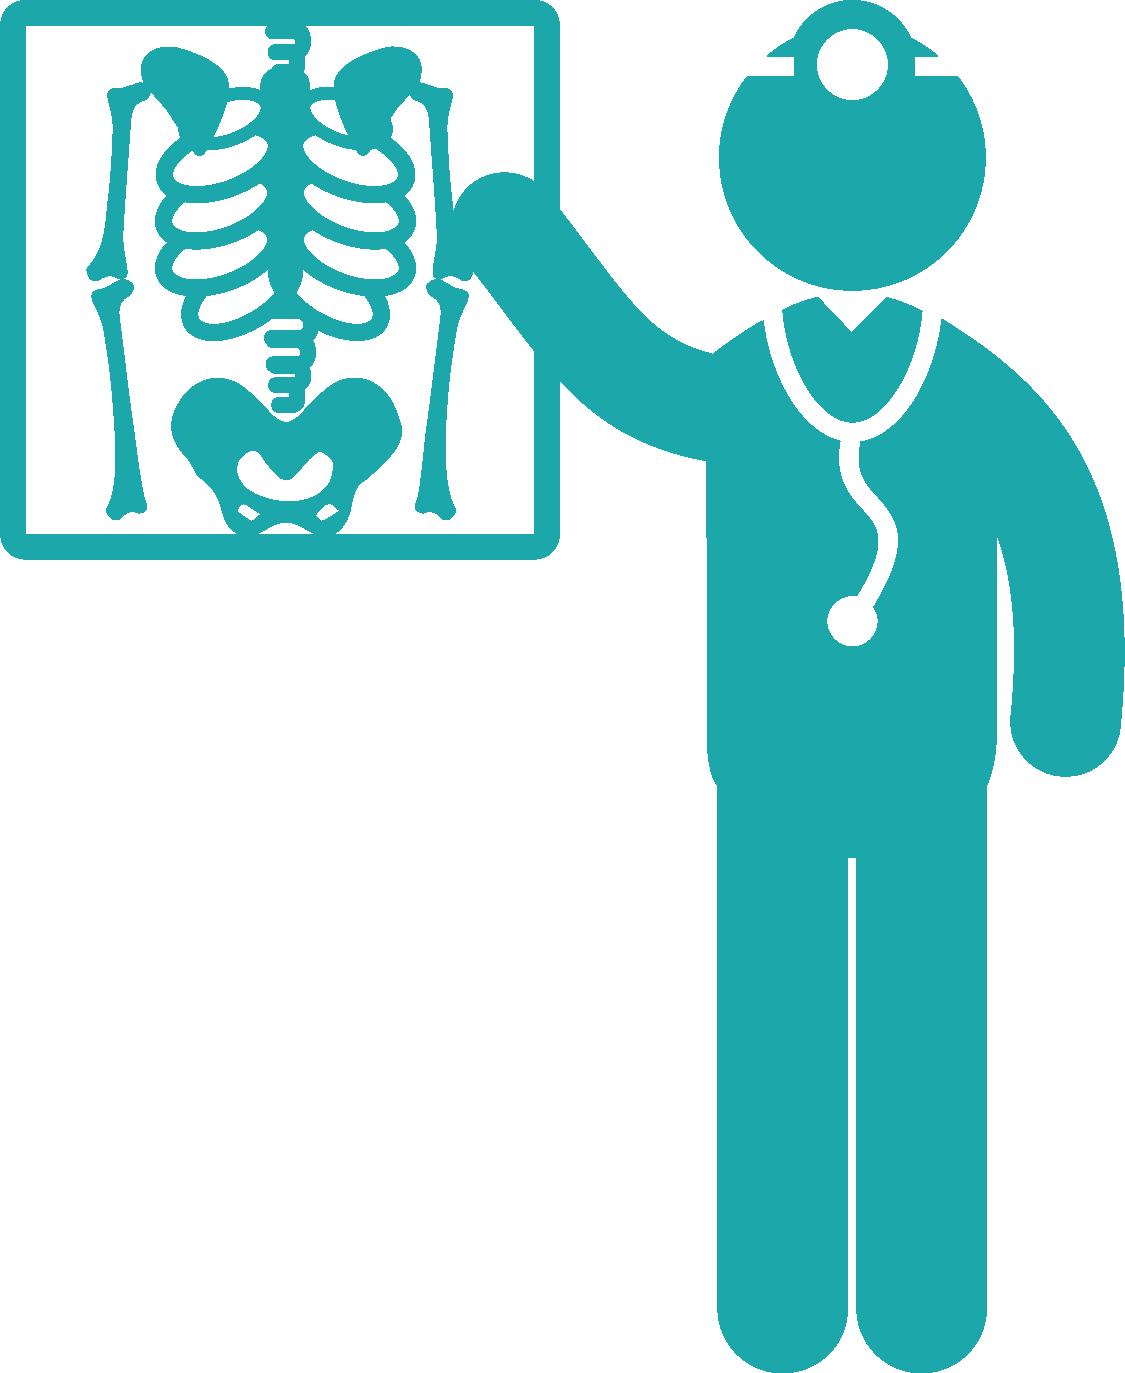 Xray clipart radiology. X ray computed tomography